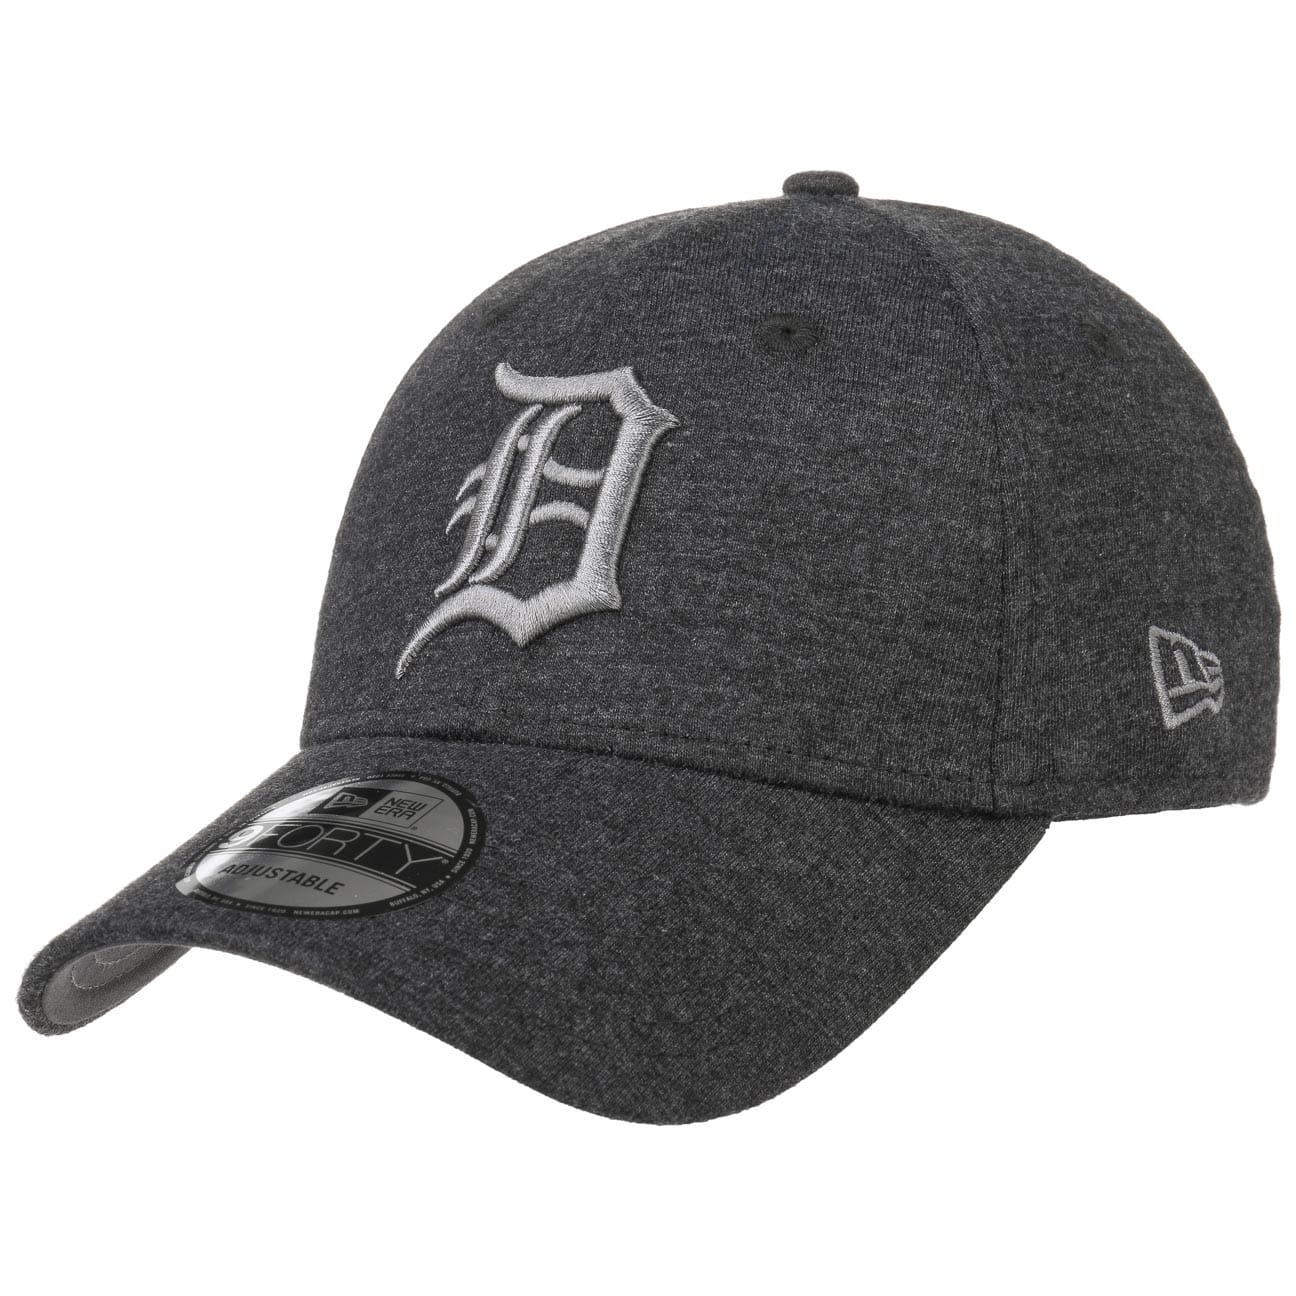 9forty-jersey-tigers-cap-by-new-era-basecap, 27.95 EUR @ hutshopping-de